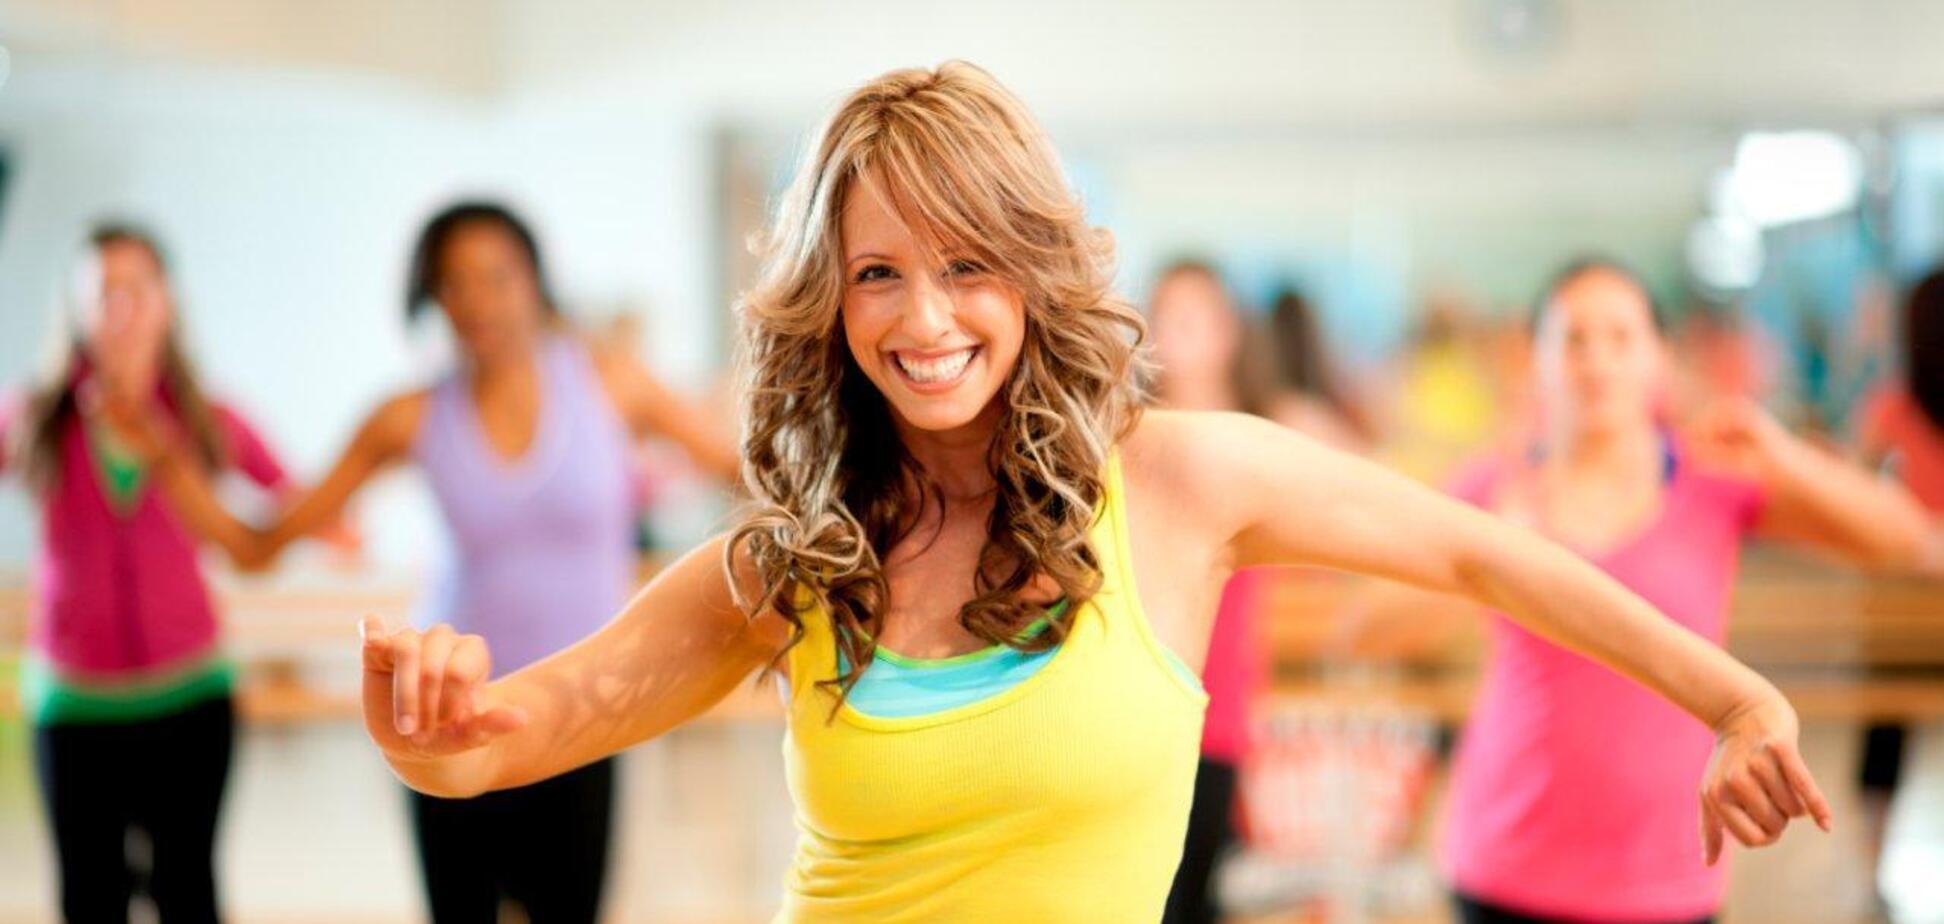 Танцевальная психотерапия: кому необходима